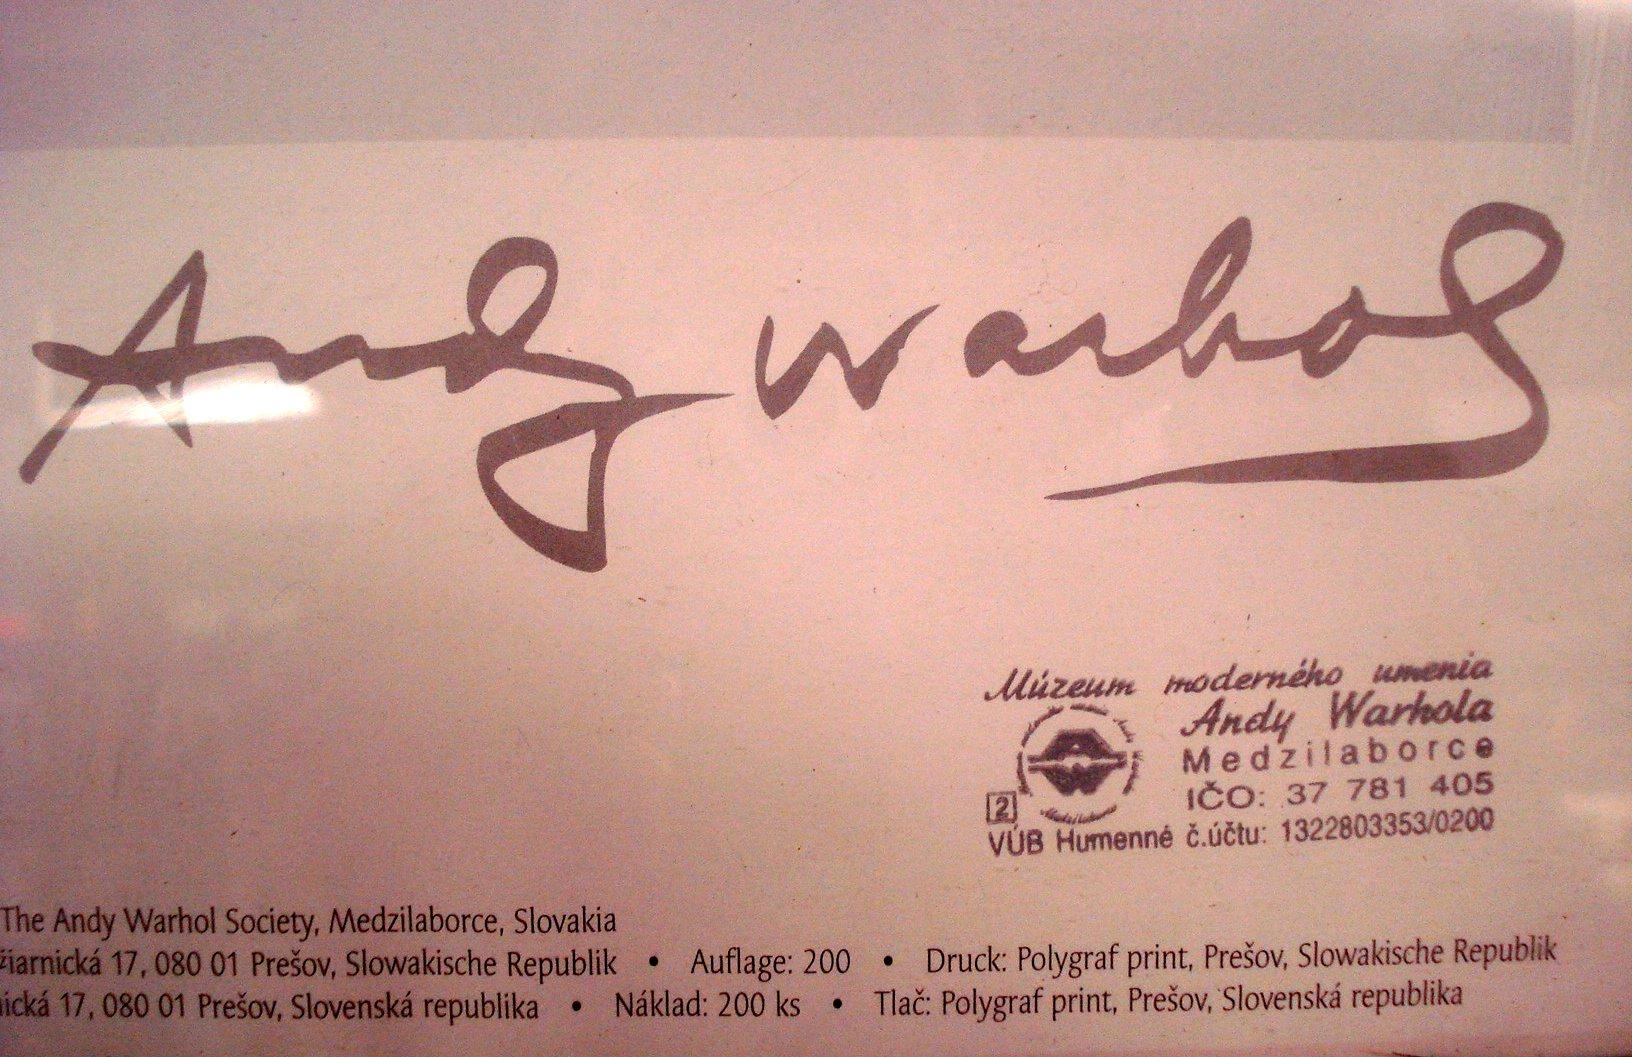 Assez andy-warhol-signature | Azio Media: Rare Books * Vinyl ** Ephemera *** GE58